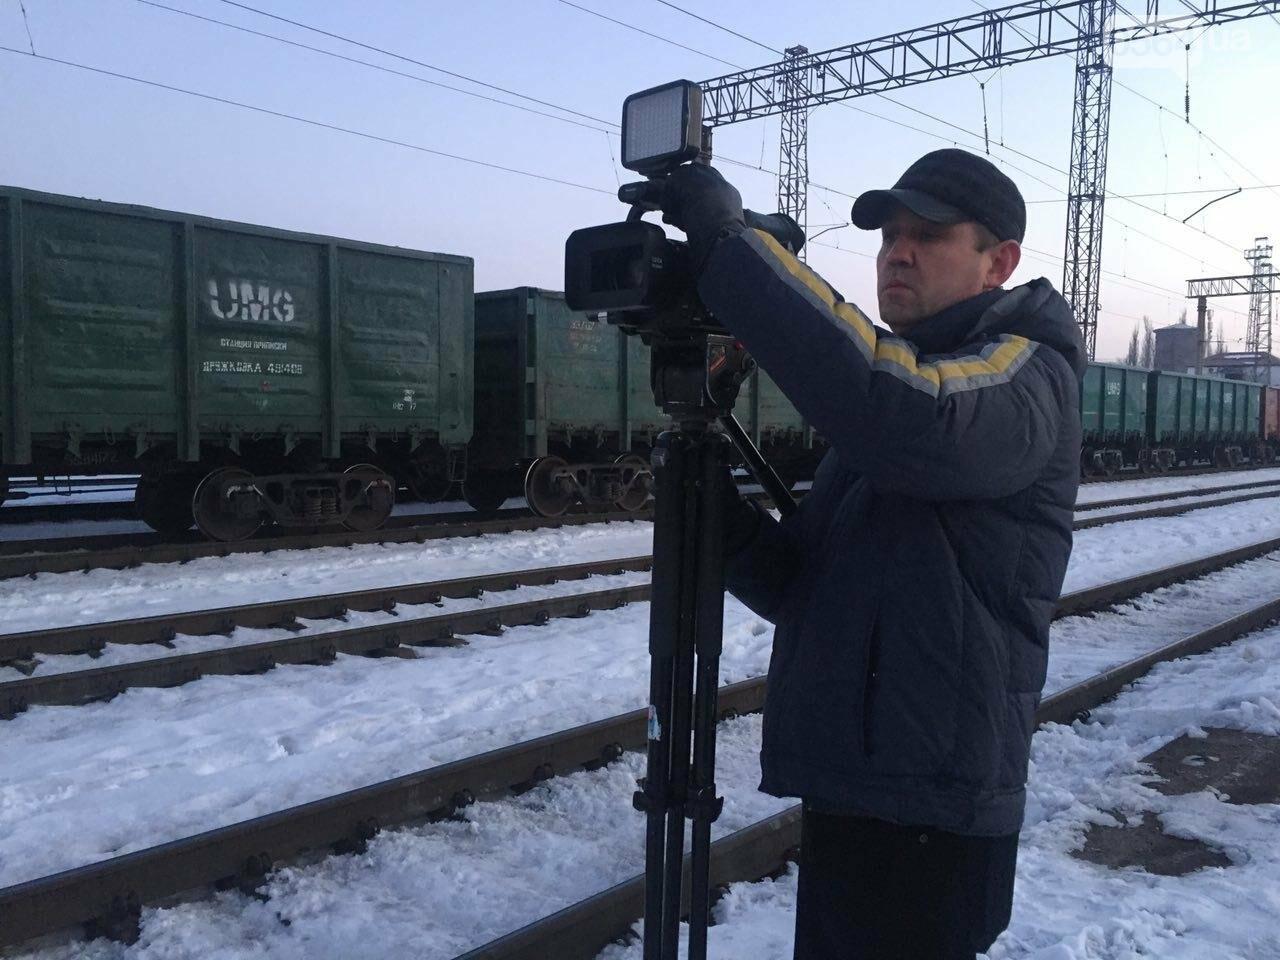 В Кривой Рог вернулся журналист Вячеслав Волк, тяжело раненый во время учений резервистов (ФОТО), фото-16